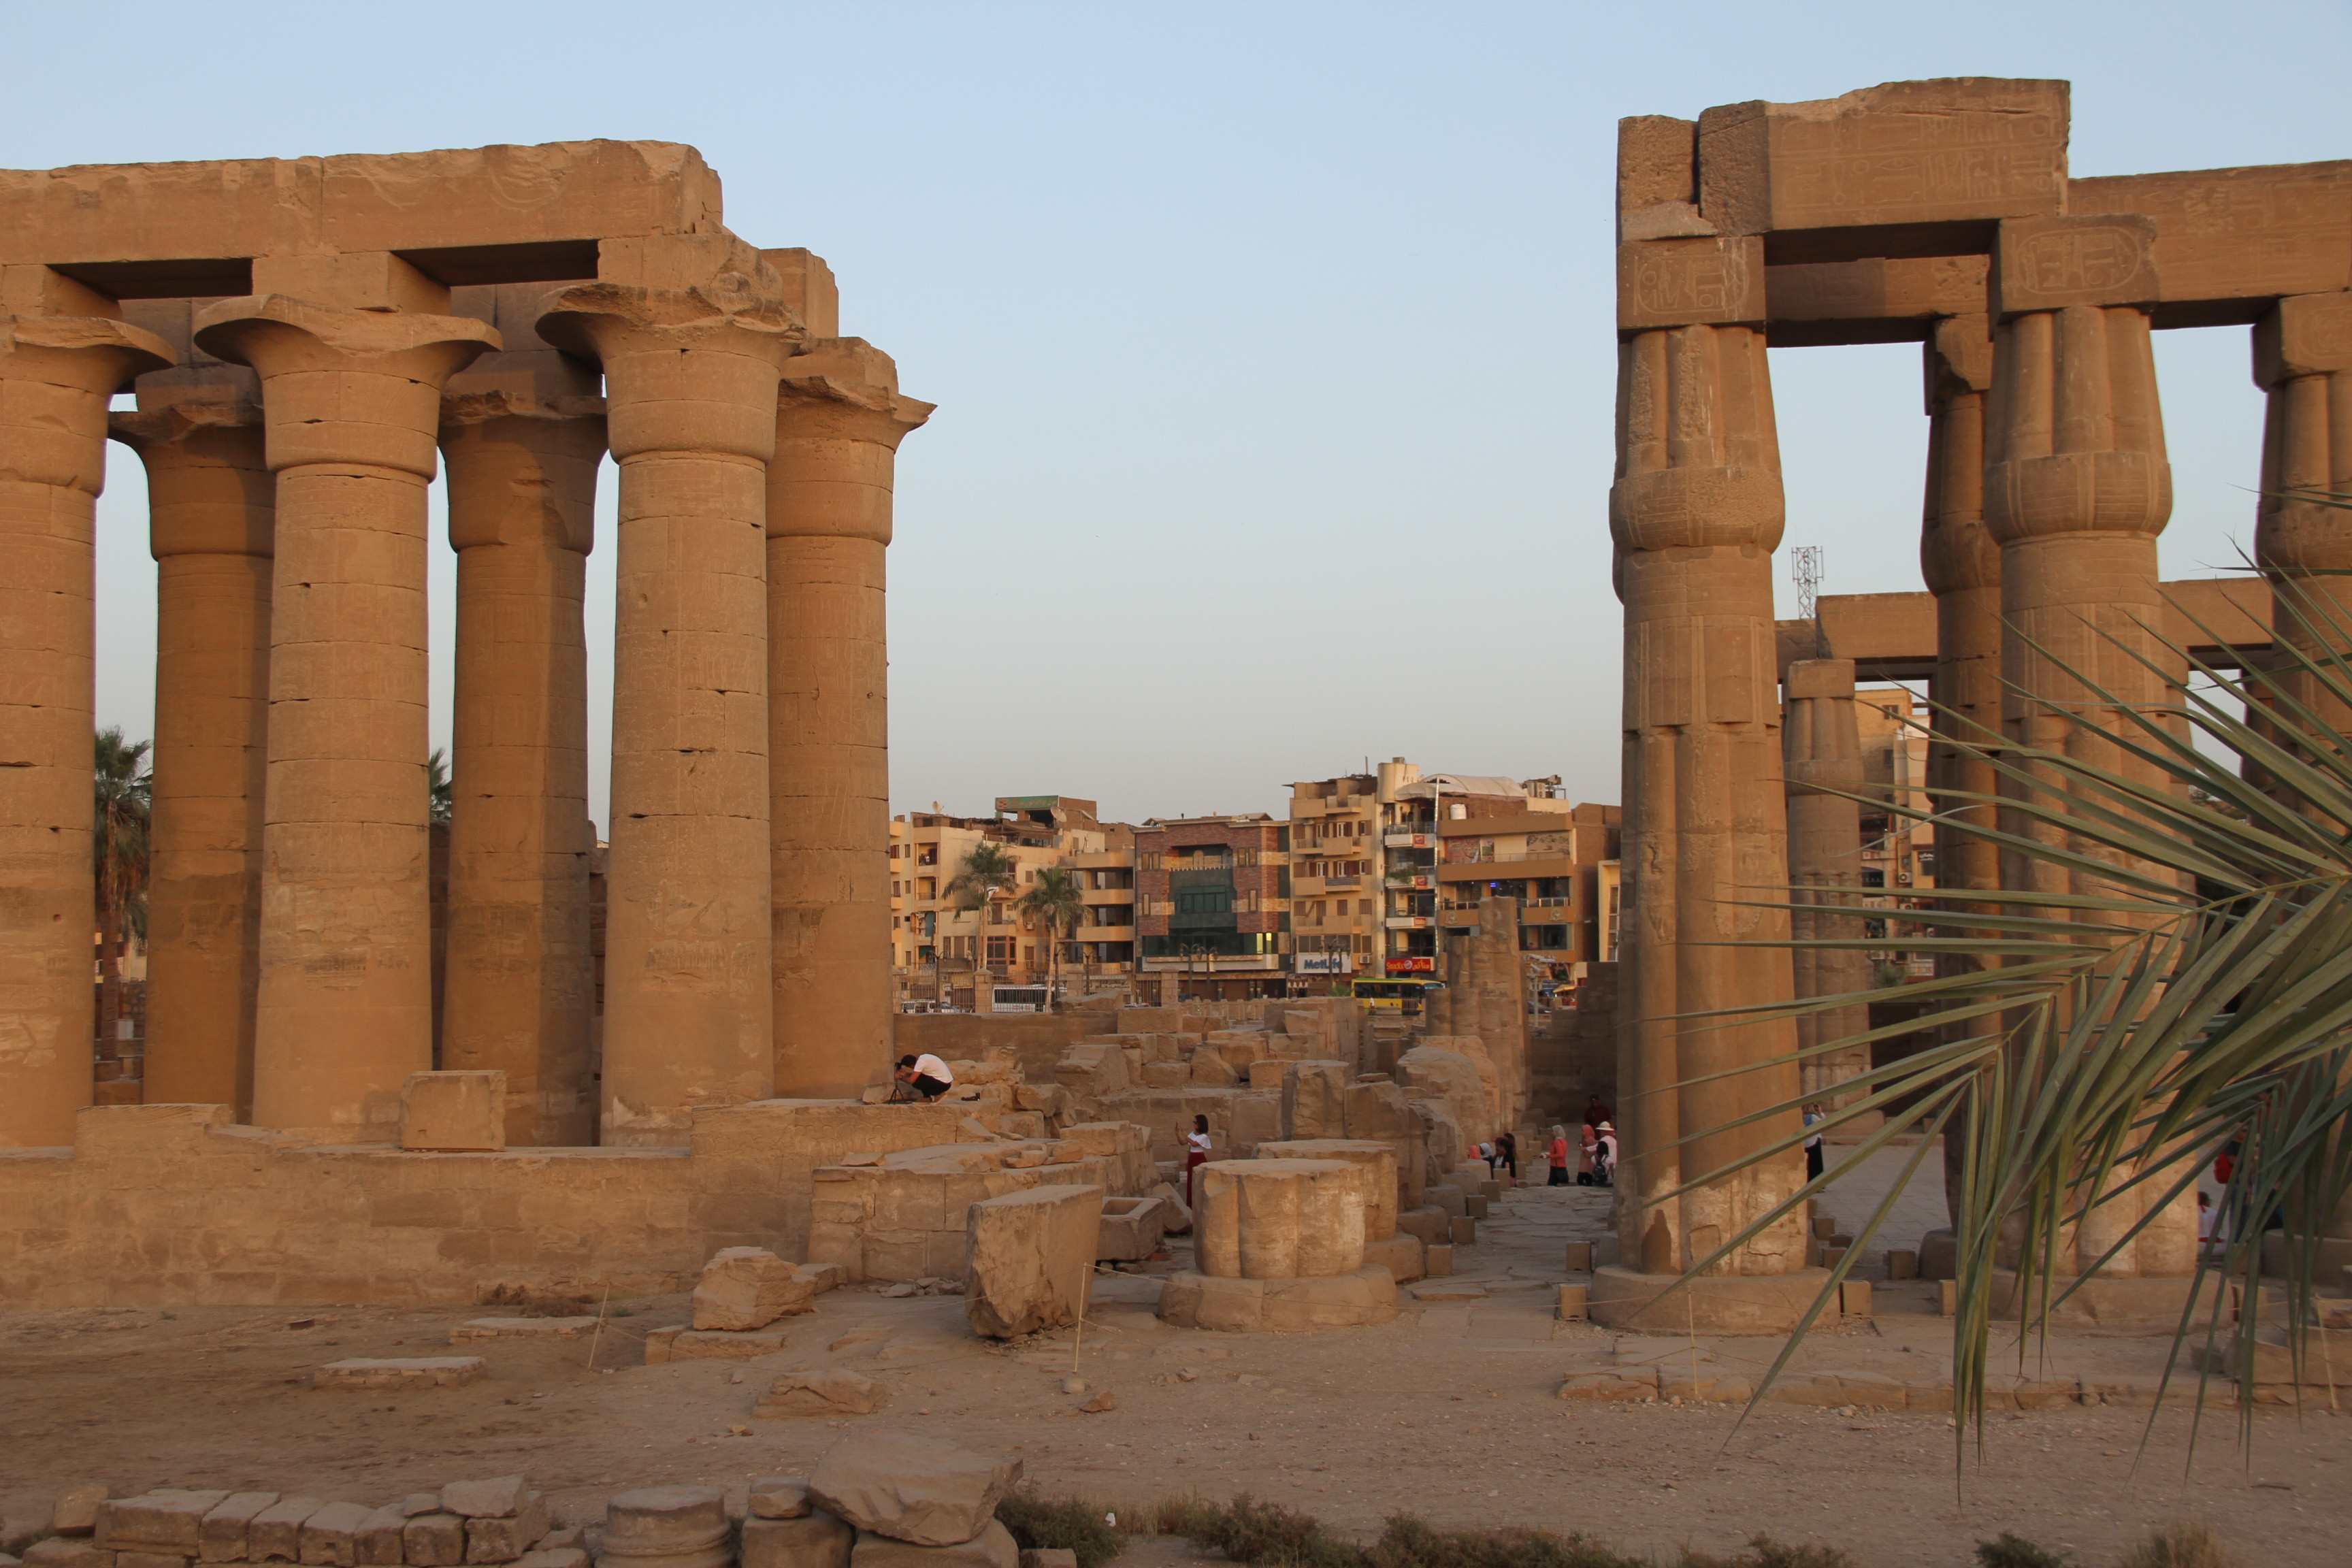 Луксор древний исовременный. Вид наколонны Луксорского храма